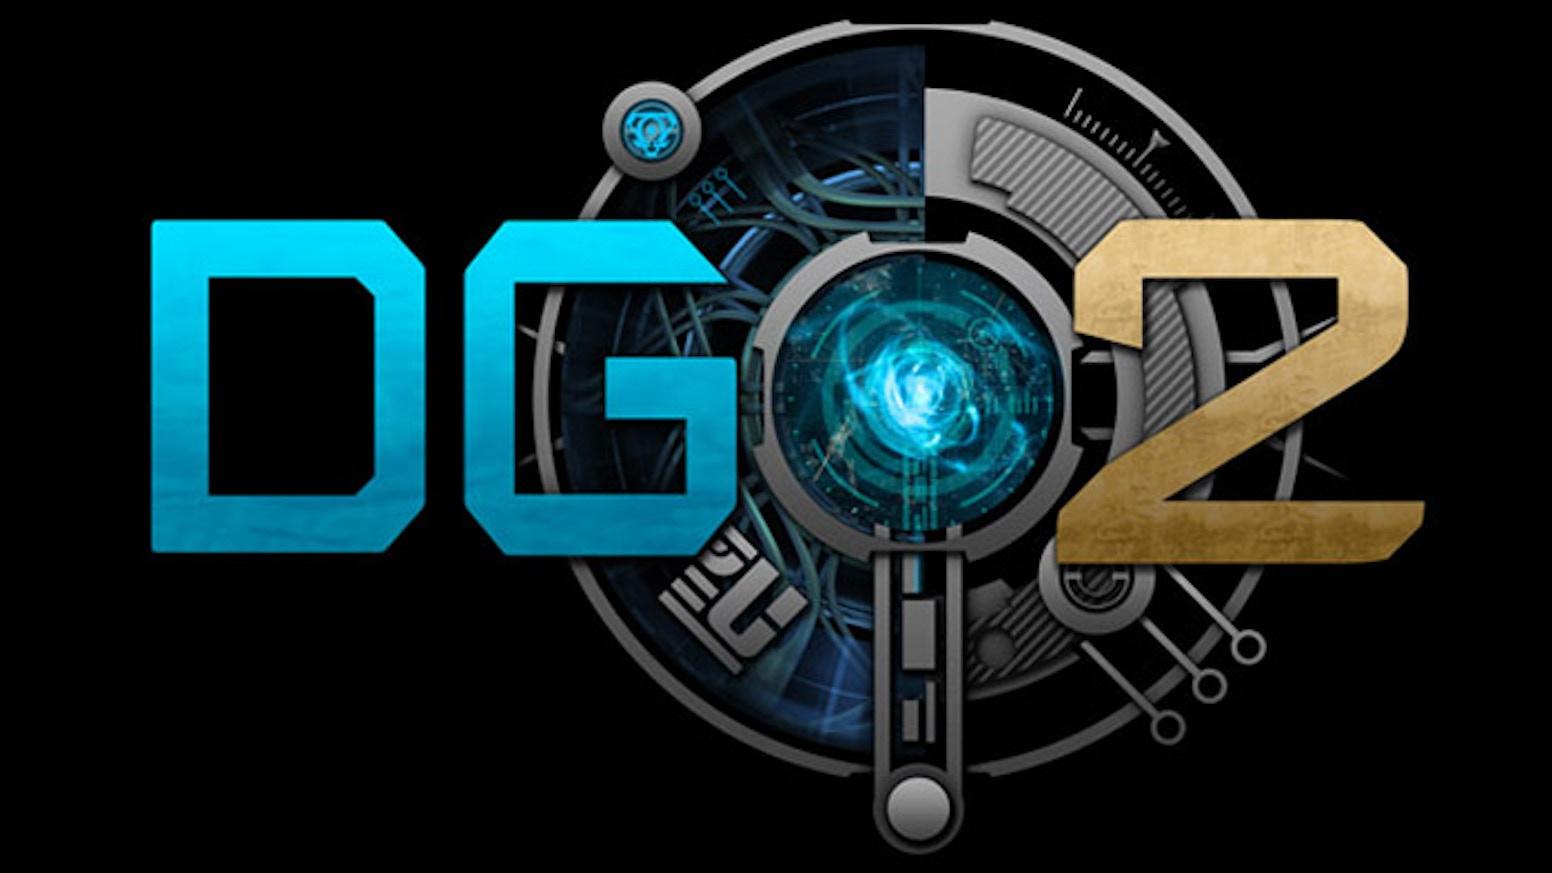 Defense Grid 2 By Hidden Path Entertainment Amd Razer Defense Grid Becomes A Board Game You Can Back It On Kickstarter Kickstarter